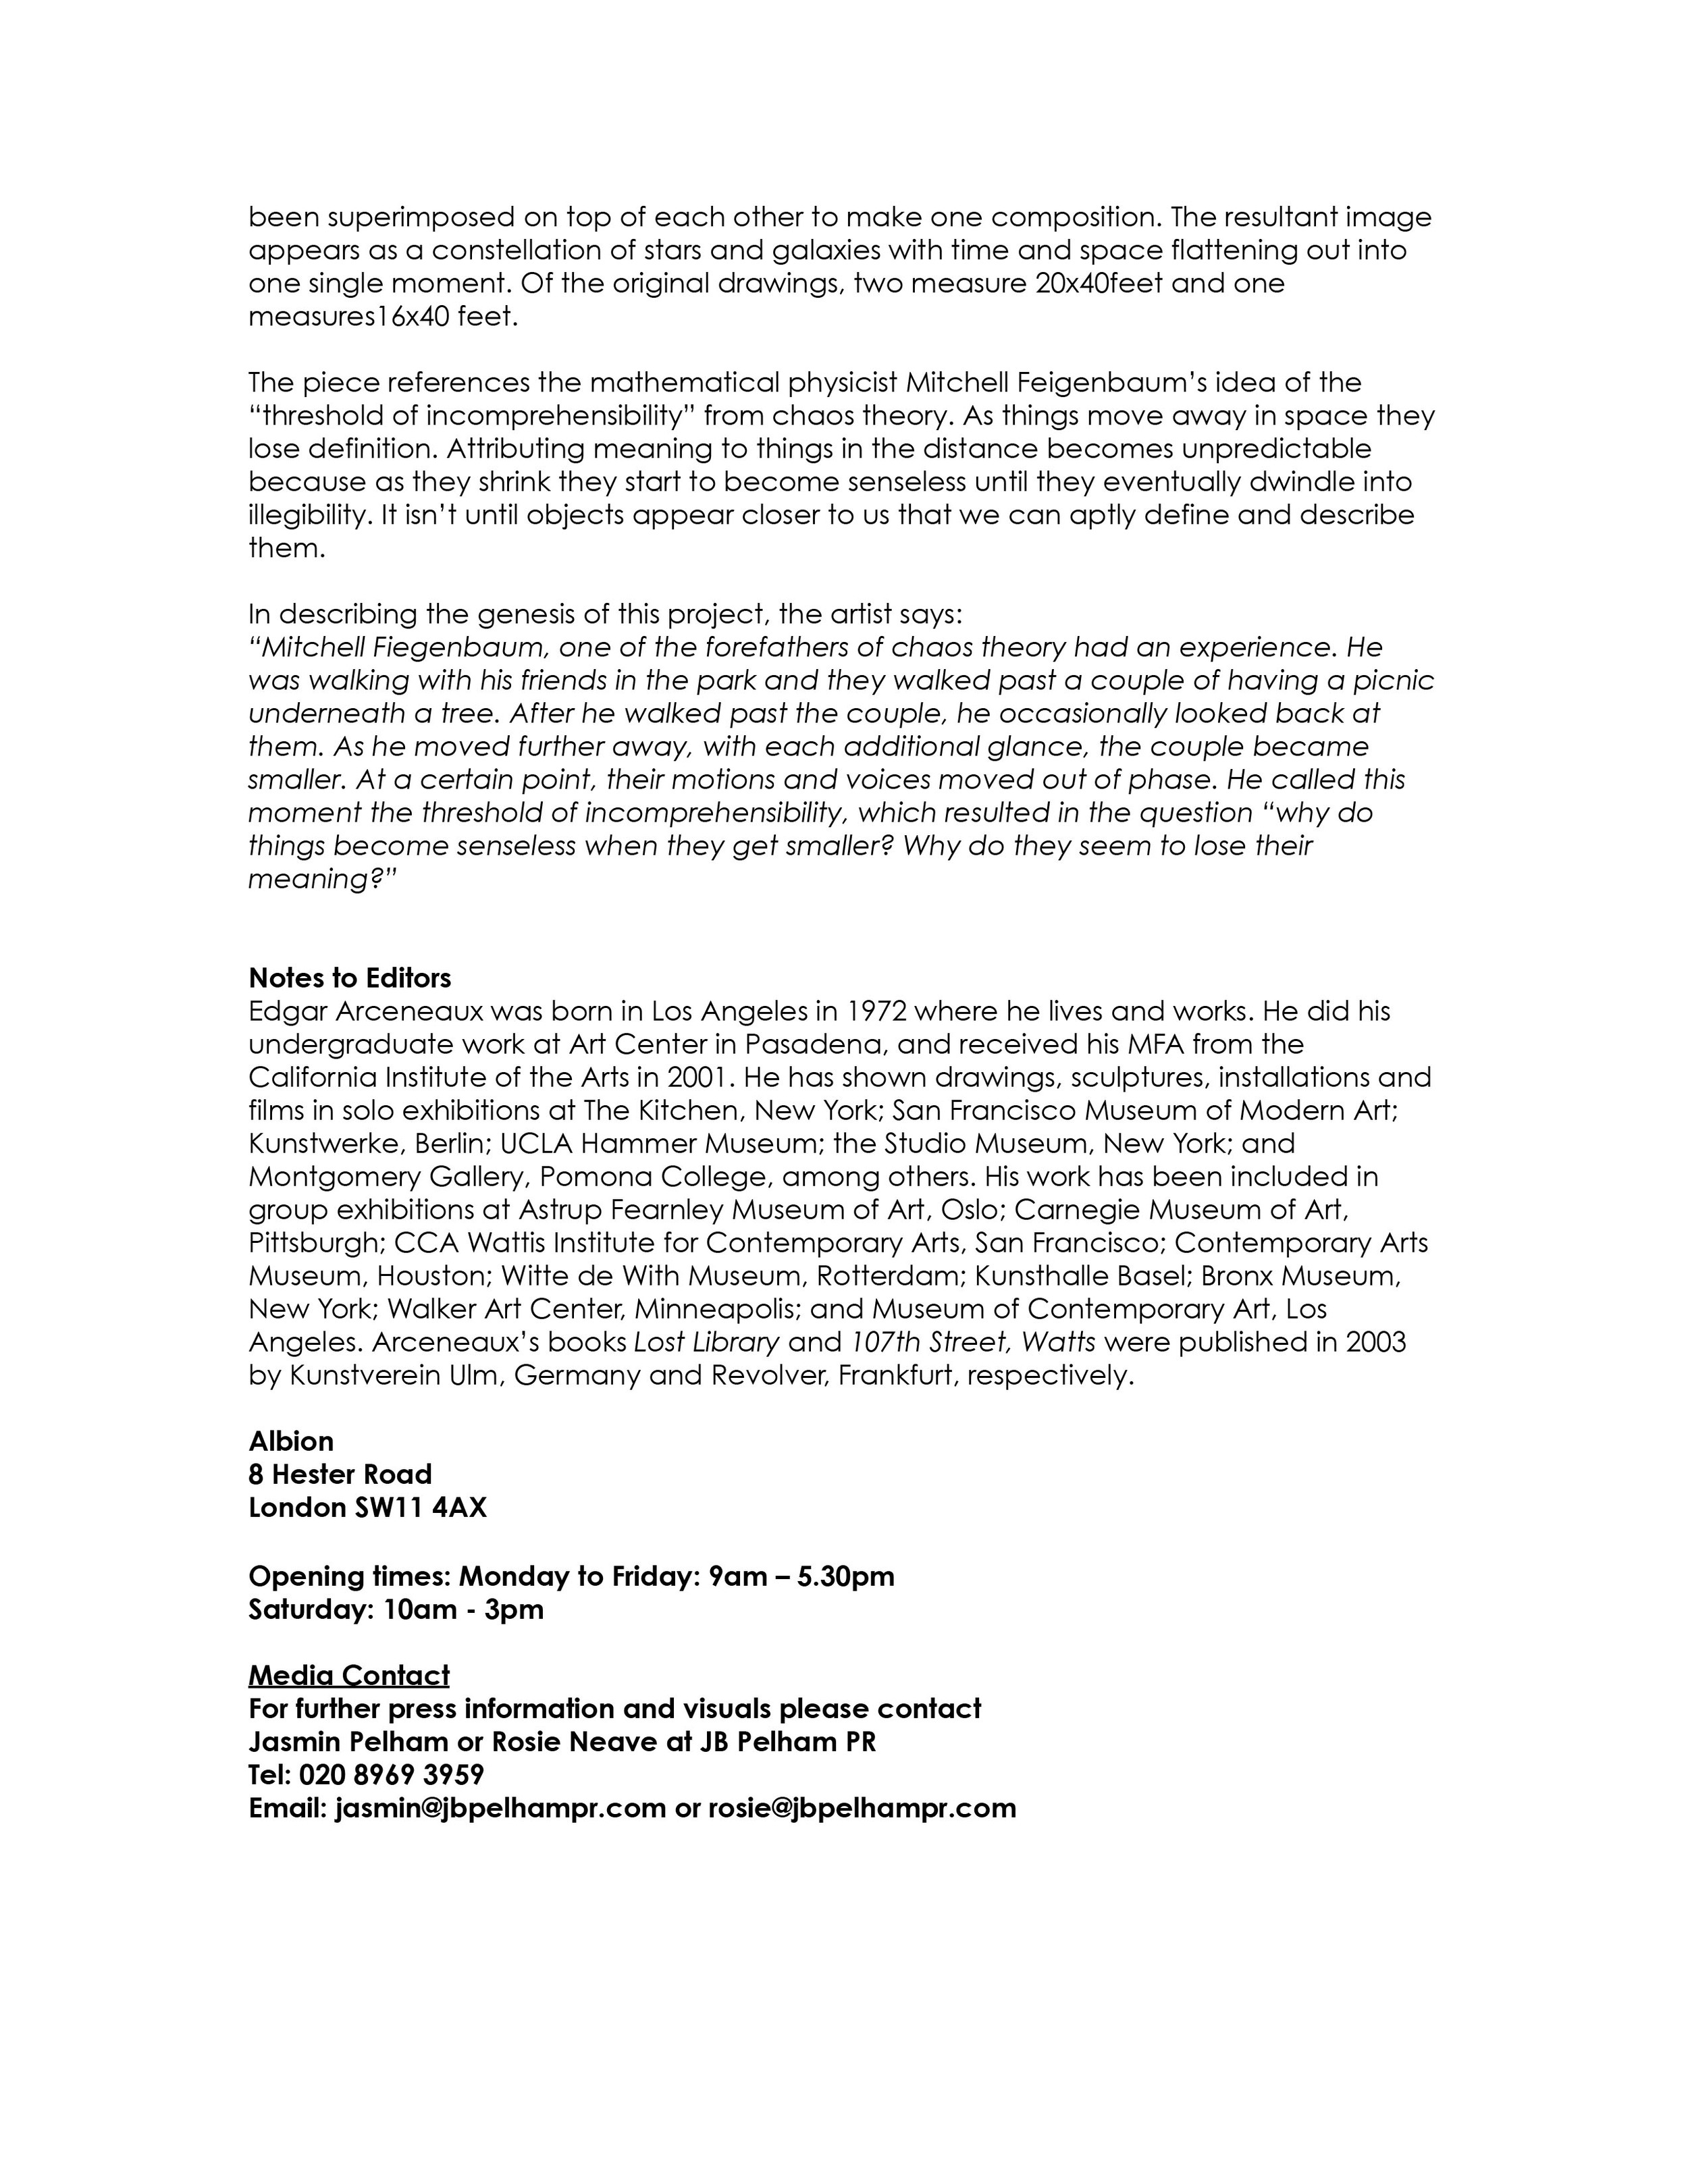 Edgar Arceneaux at Albion 26 January - 28 February, Press Release-2.jpg